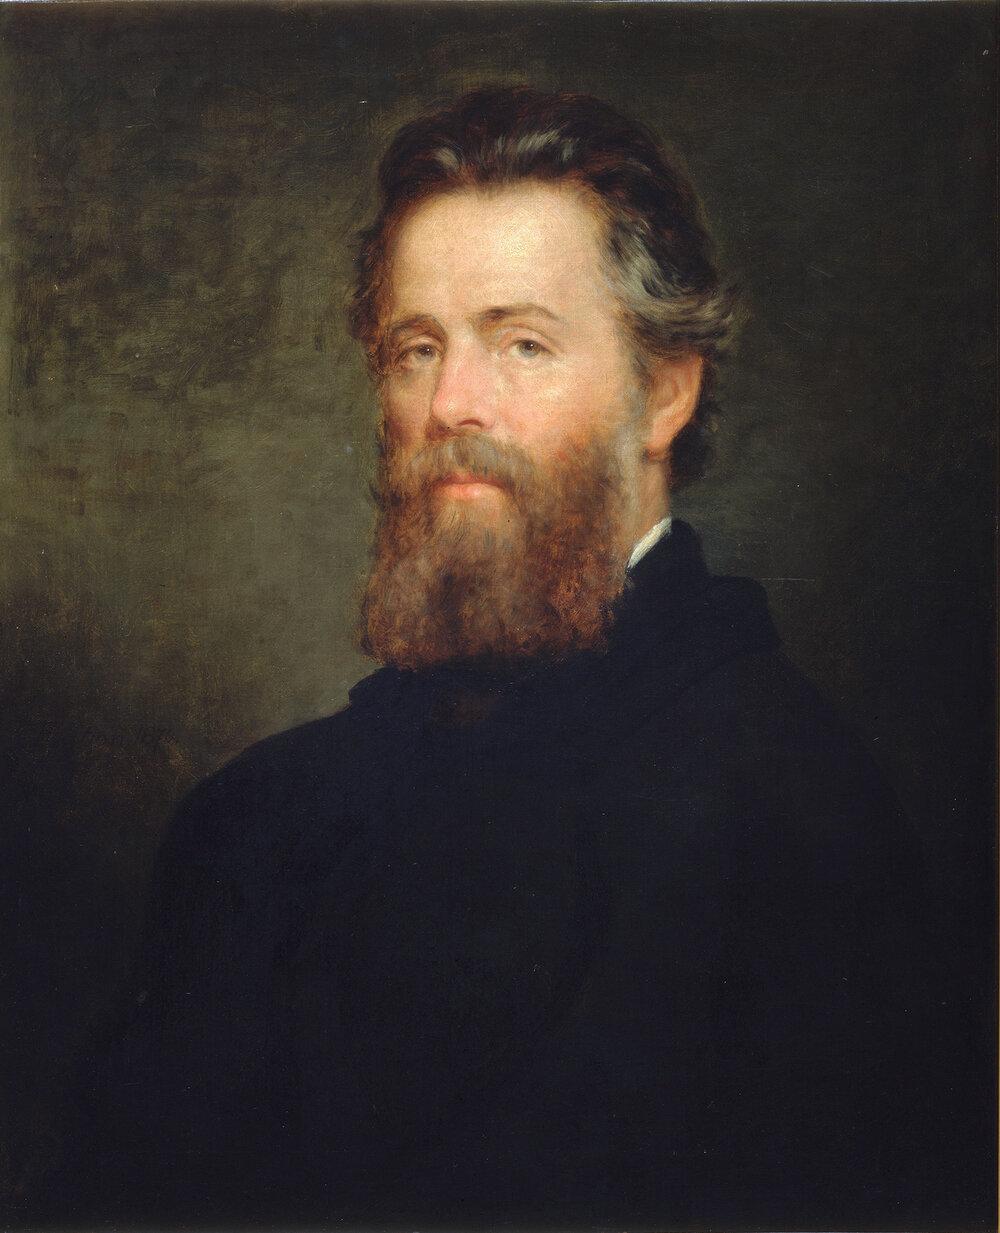 Herman Melville, 1870; oil painting by Joseph Oriel Eaton (1829-1875), the Houghton Library, Harvard University